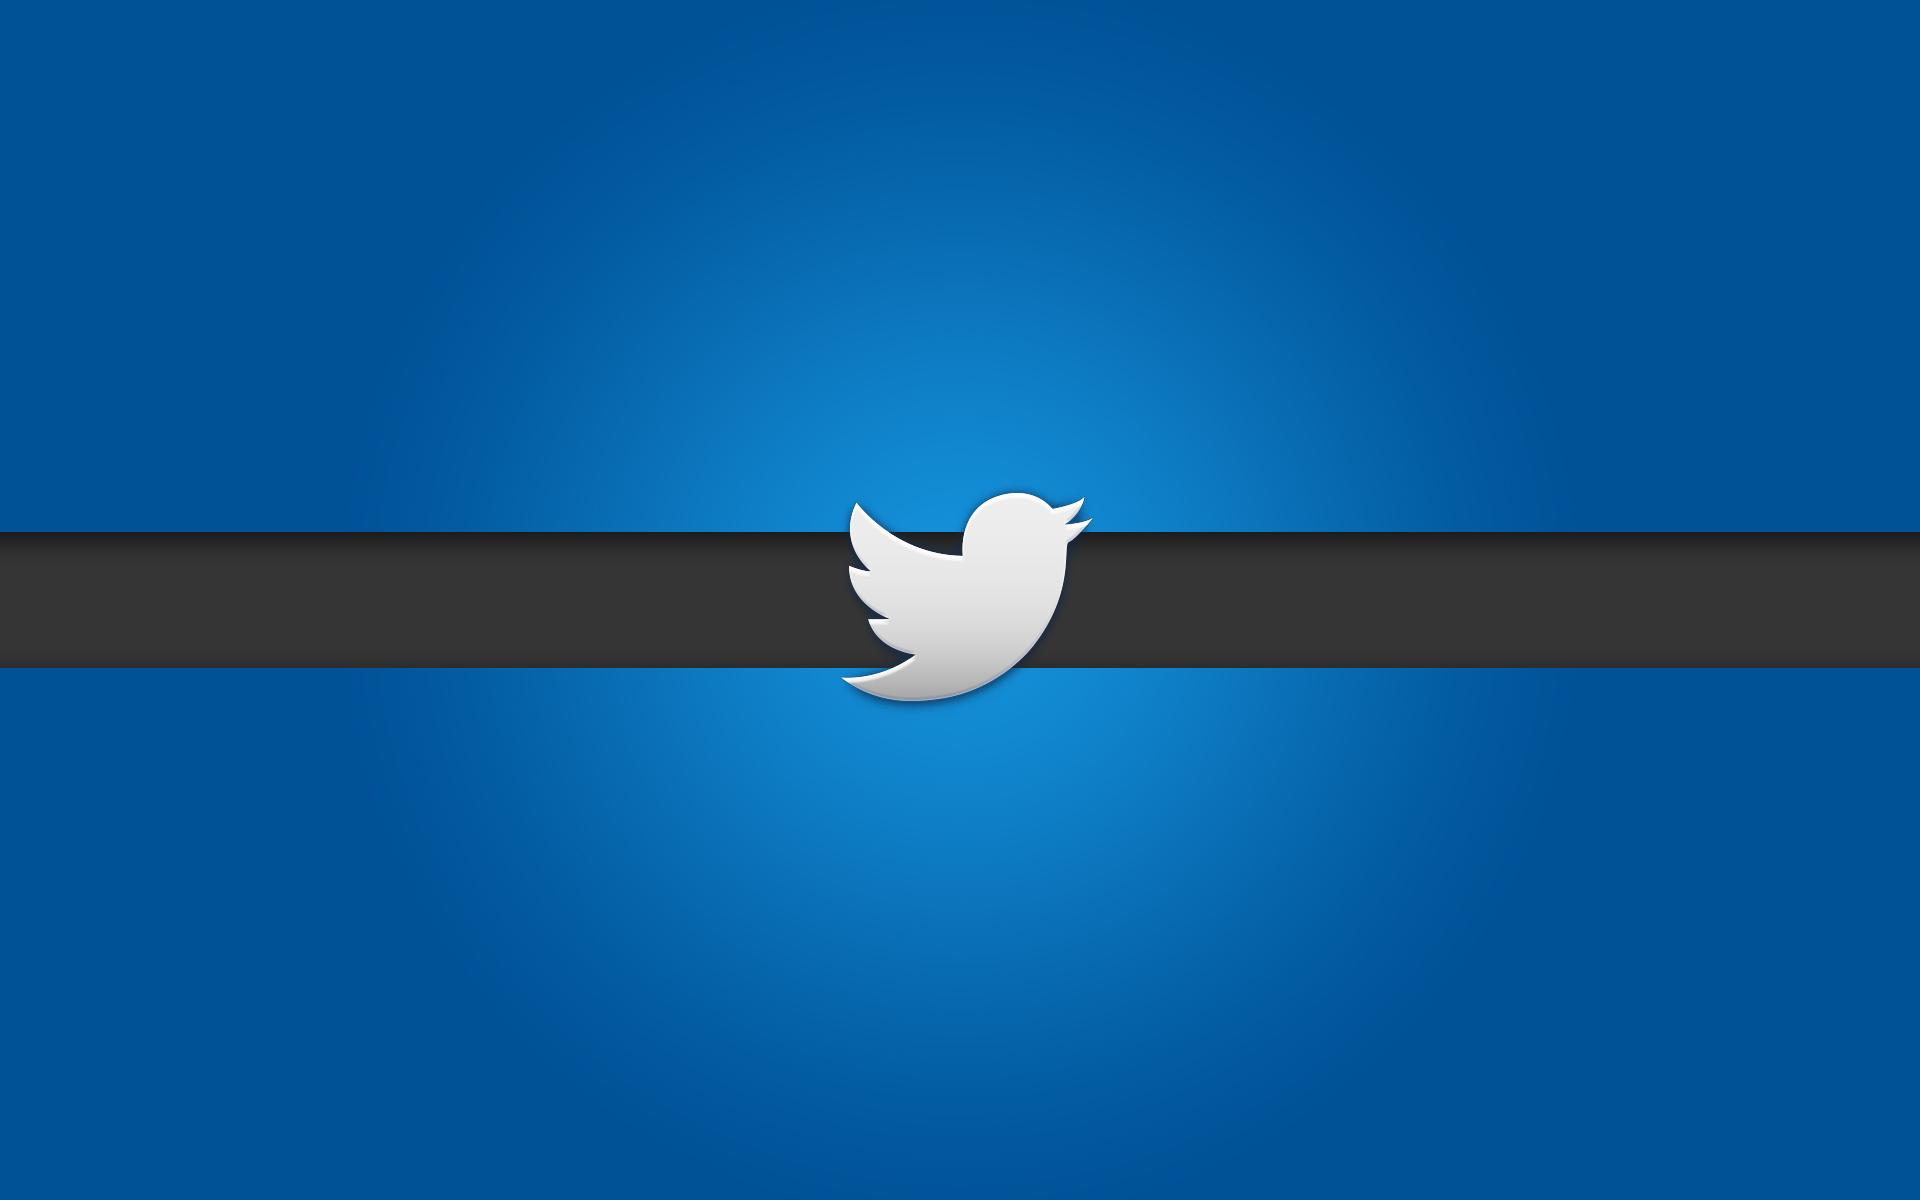 twitter logo desktop wallpaper 67338